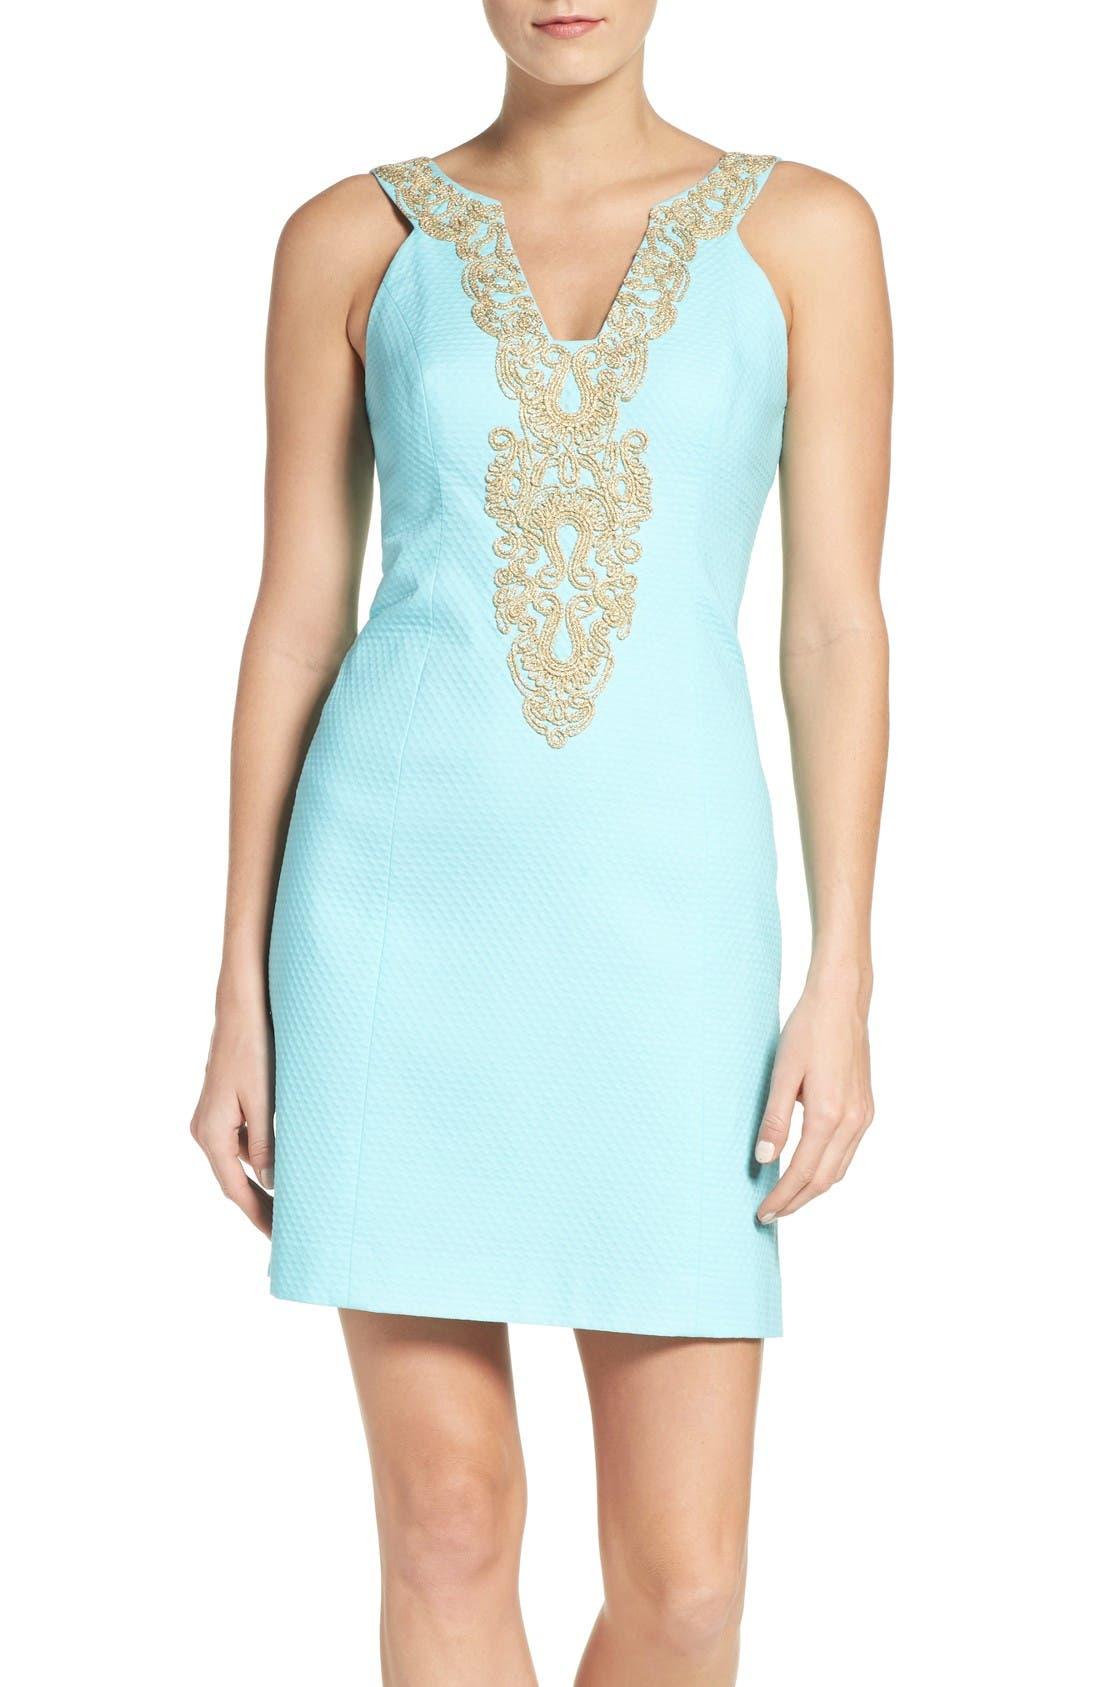 LILLY PULITZER® Suzette Sheath Dress